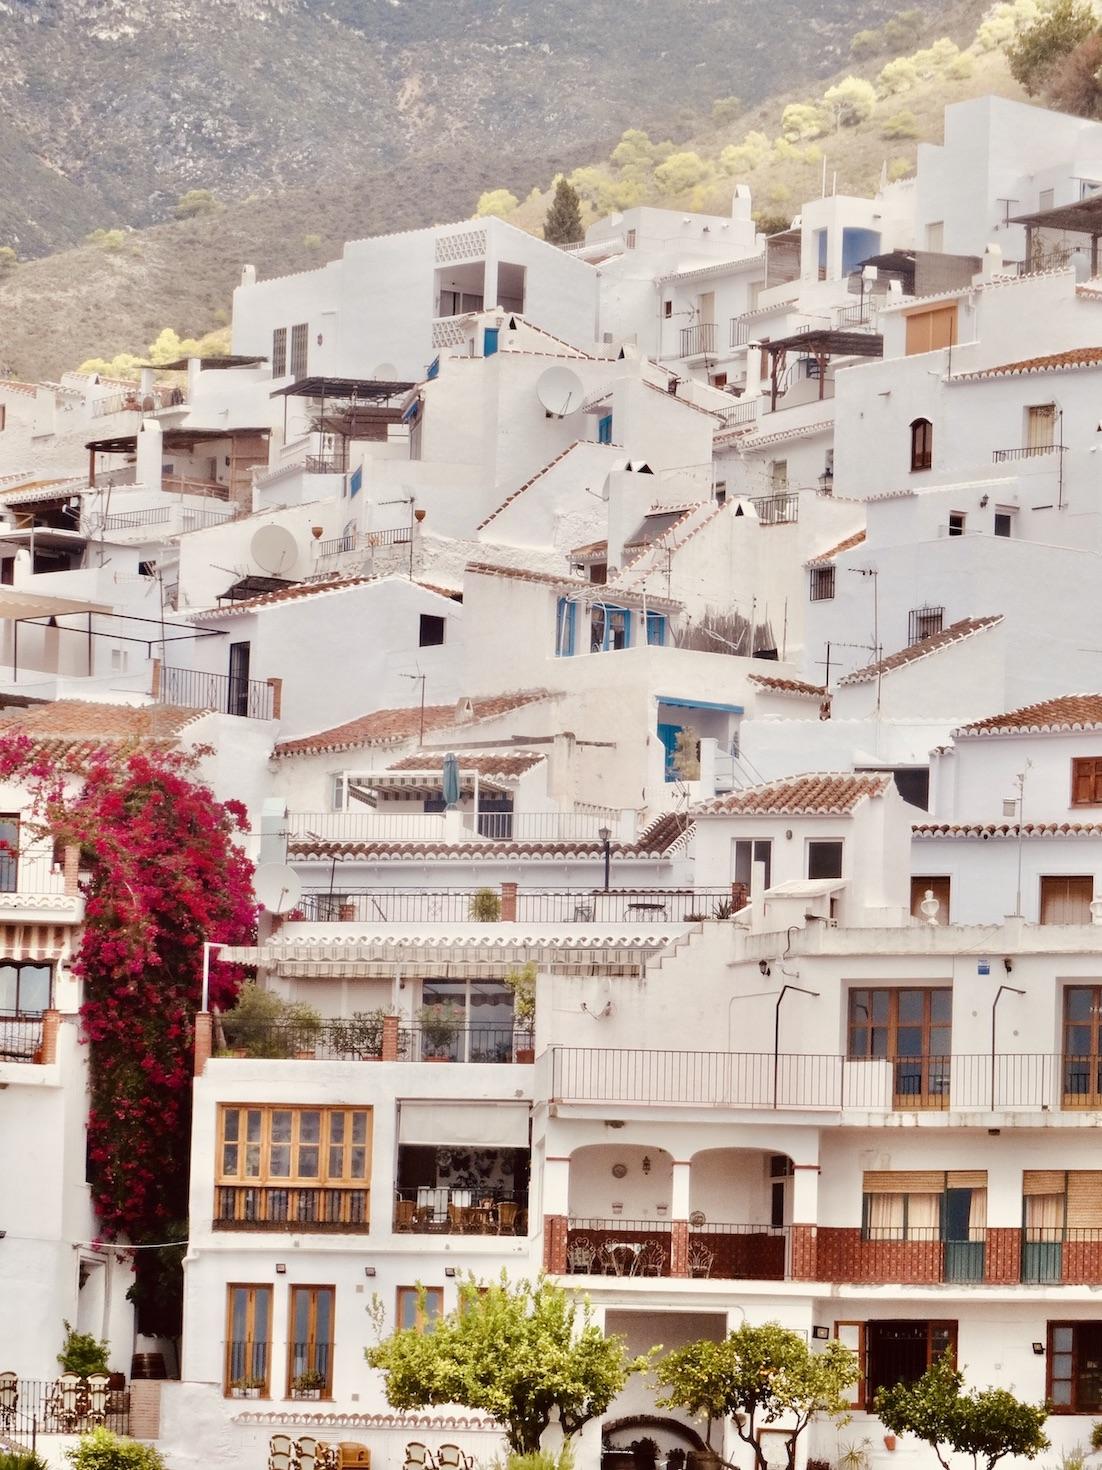 Frigiliana whitewashed town Spain.